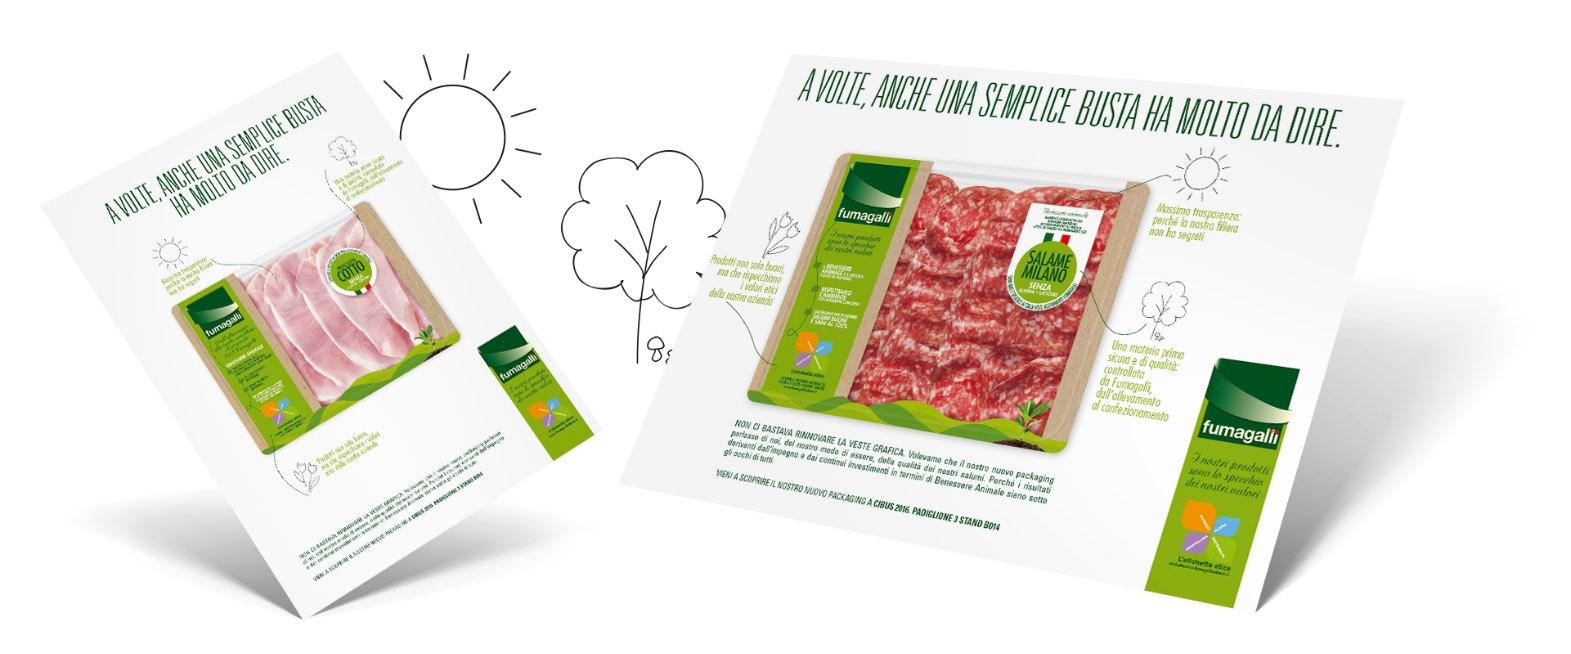 materiali punto vendita confezioni packaging salumi Fumagalli etichetta etica